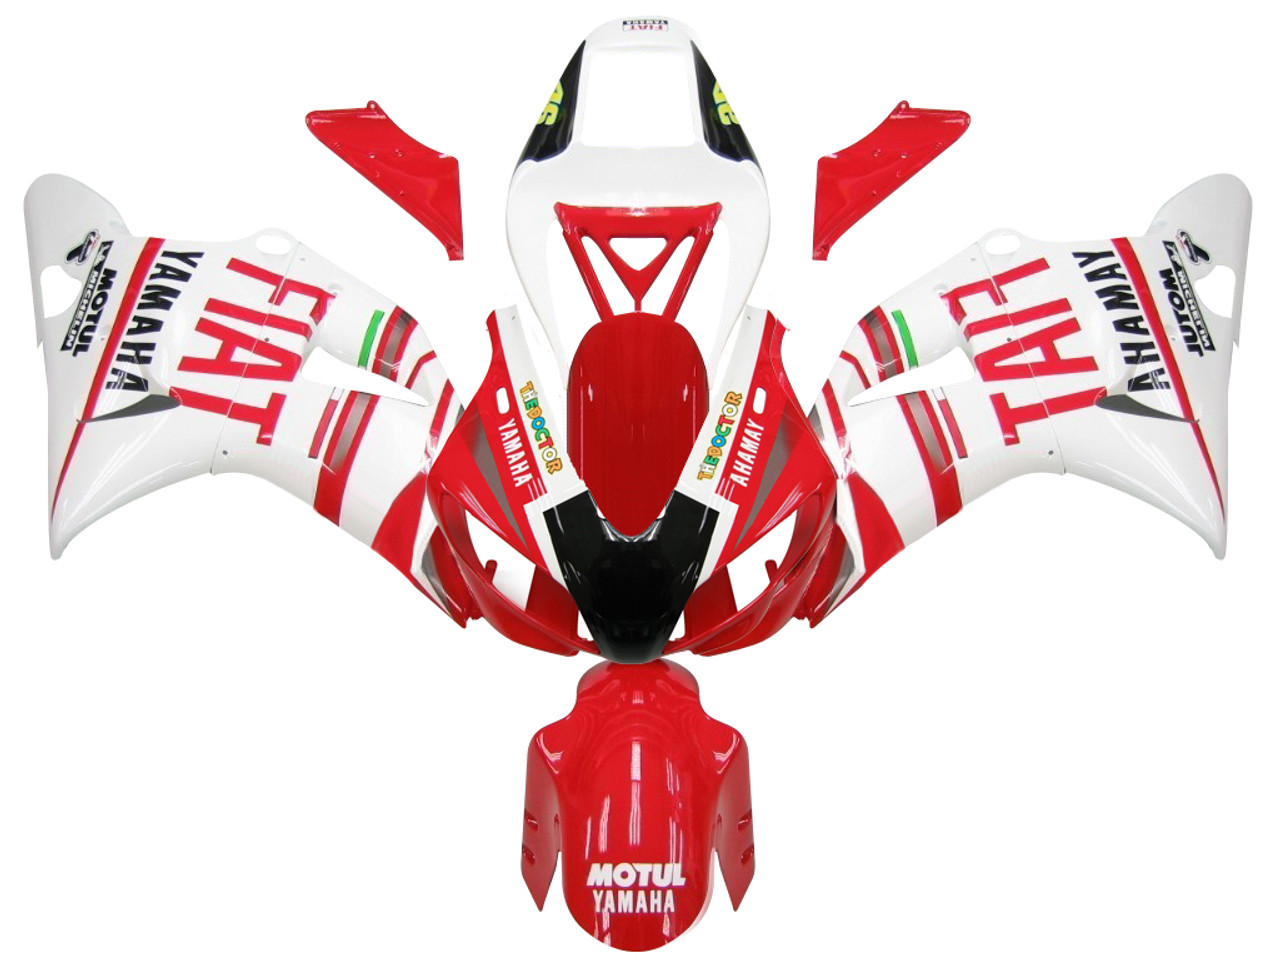 Fairings Yamaha YZF-R1 Red White No.46 FIAT  R1 Racing (1998-1999)